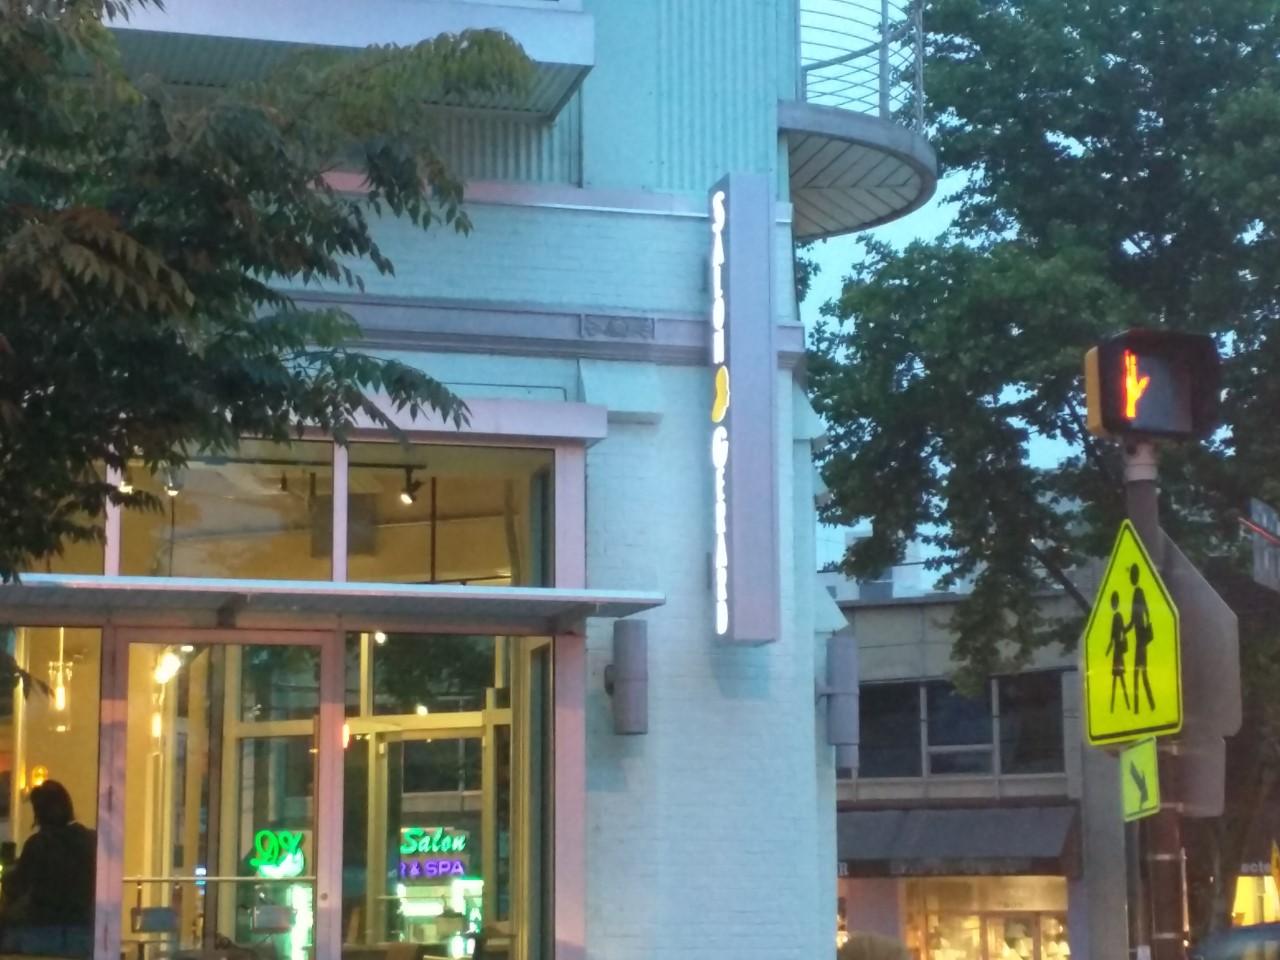 Robert Dyer @ Bethesda Row: One downtown Bethesda hair salon closes ...